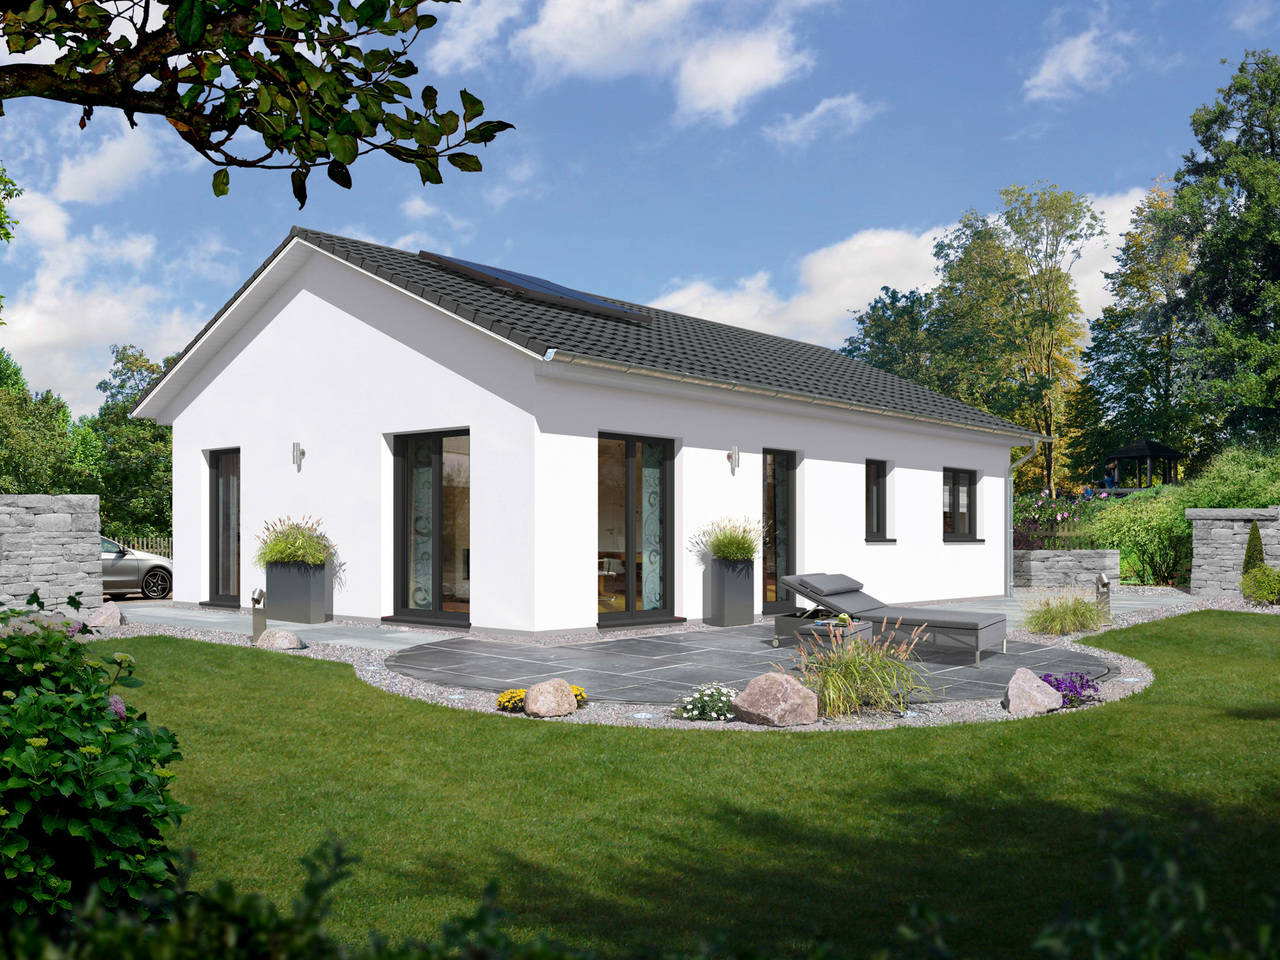 Bungalow 100 elegance A3 von FIMA Hausbau